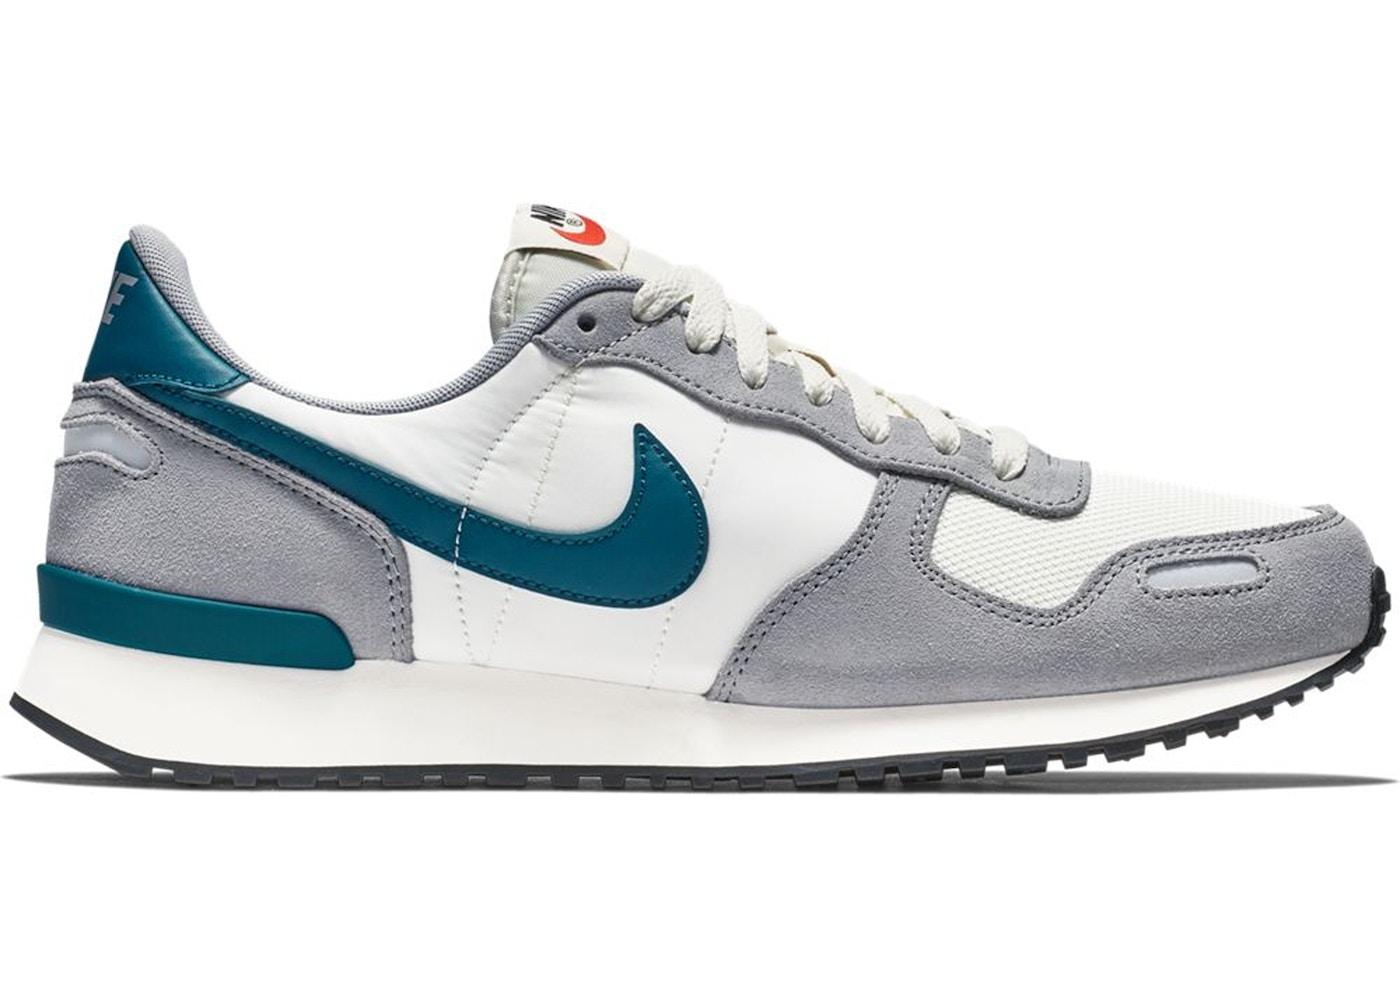 Huelga Enfriarse Pantalones  Nike Air Vortex Wolf Grey Blue Force - 903896-016